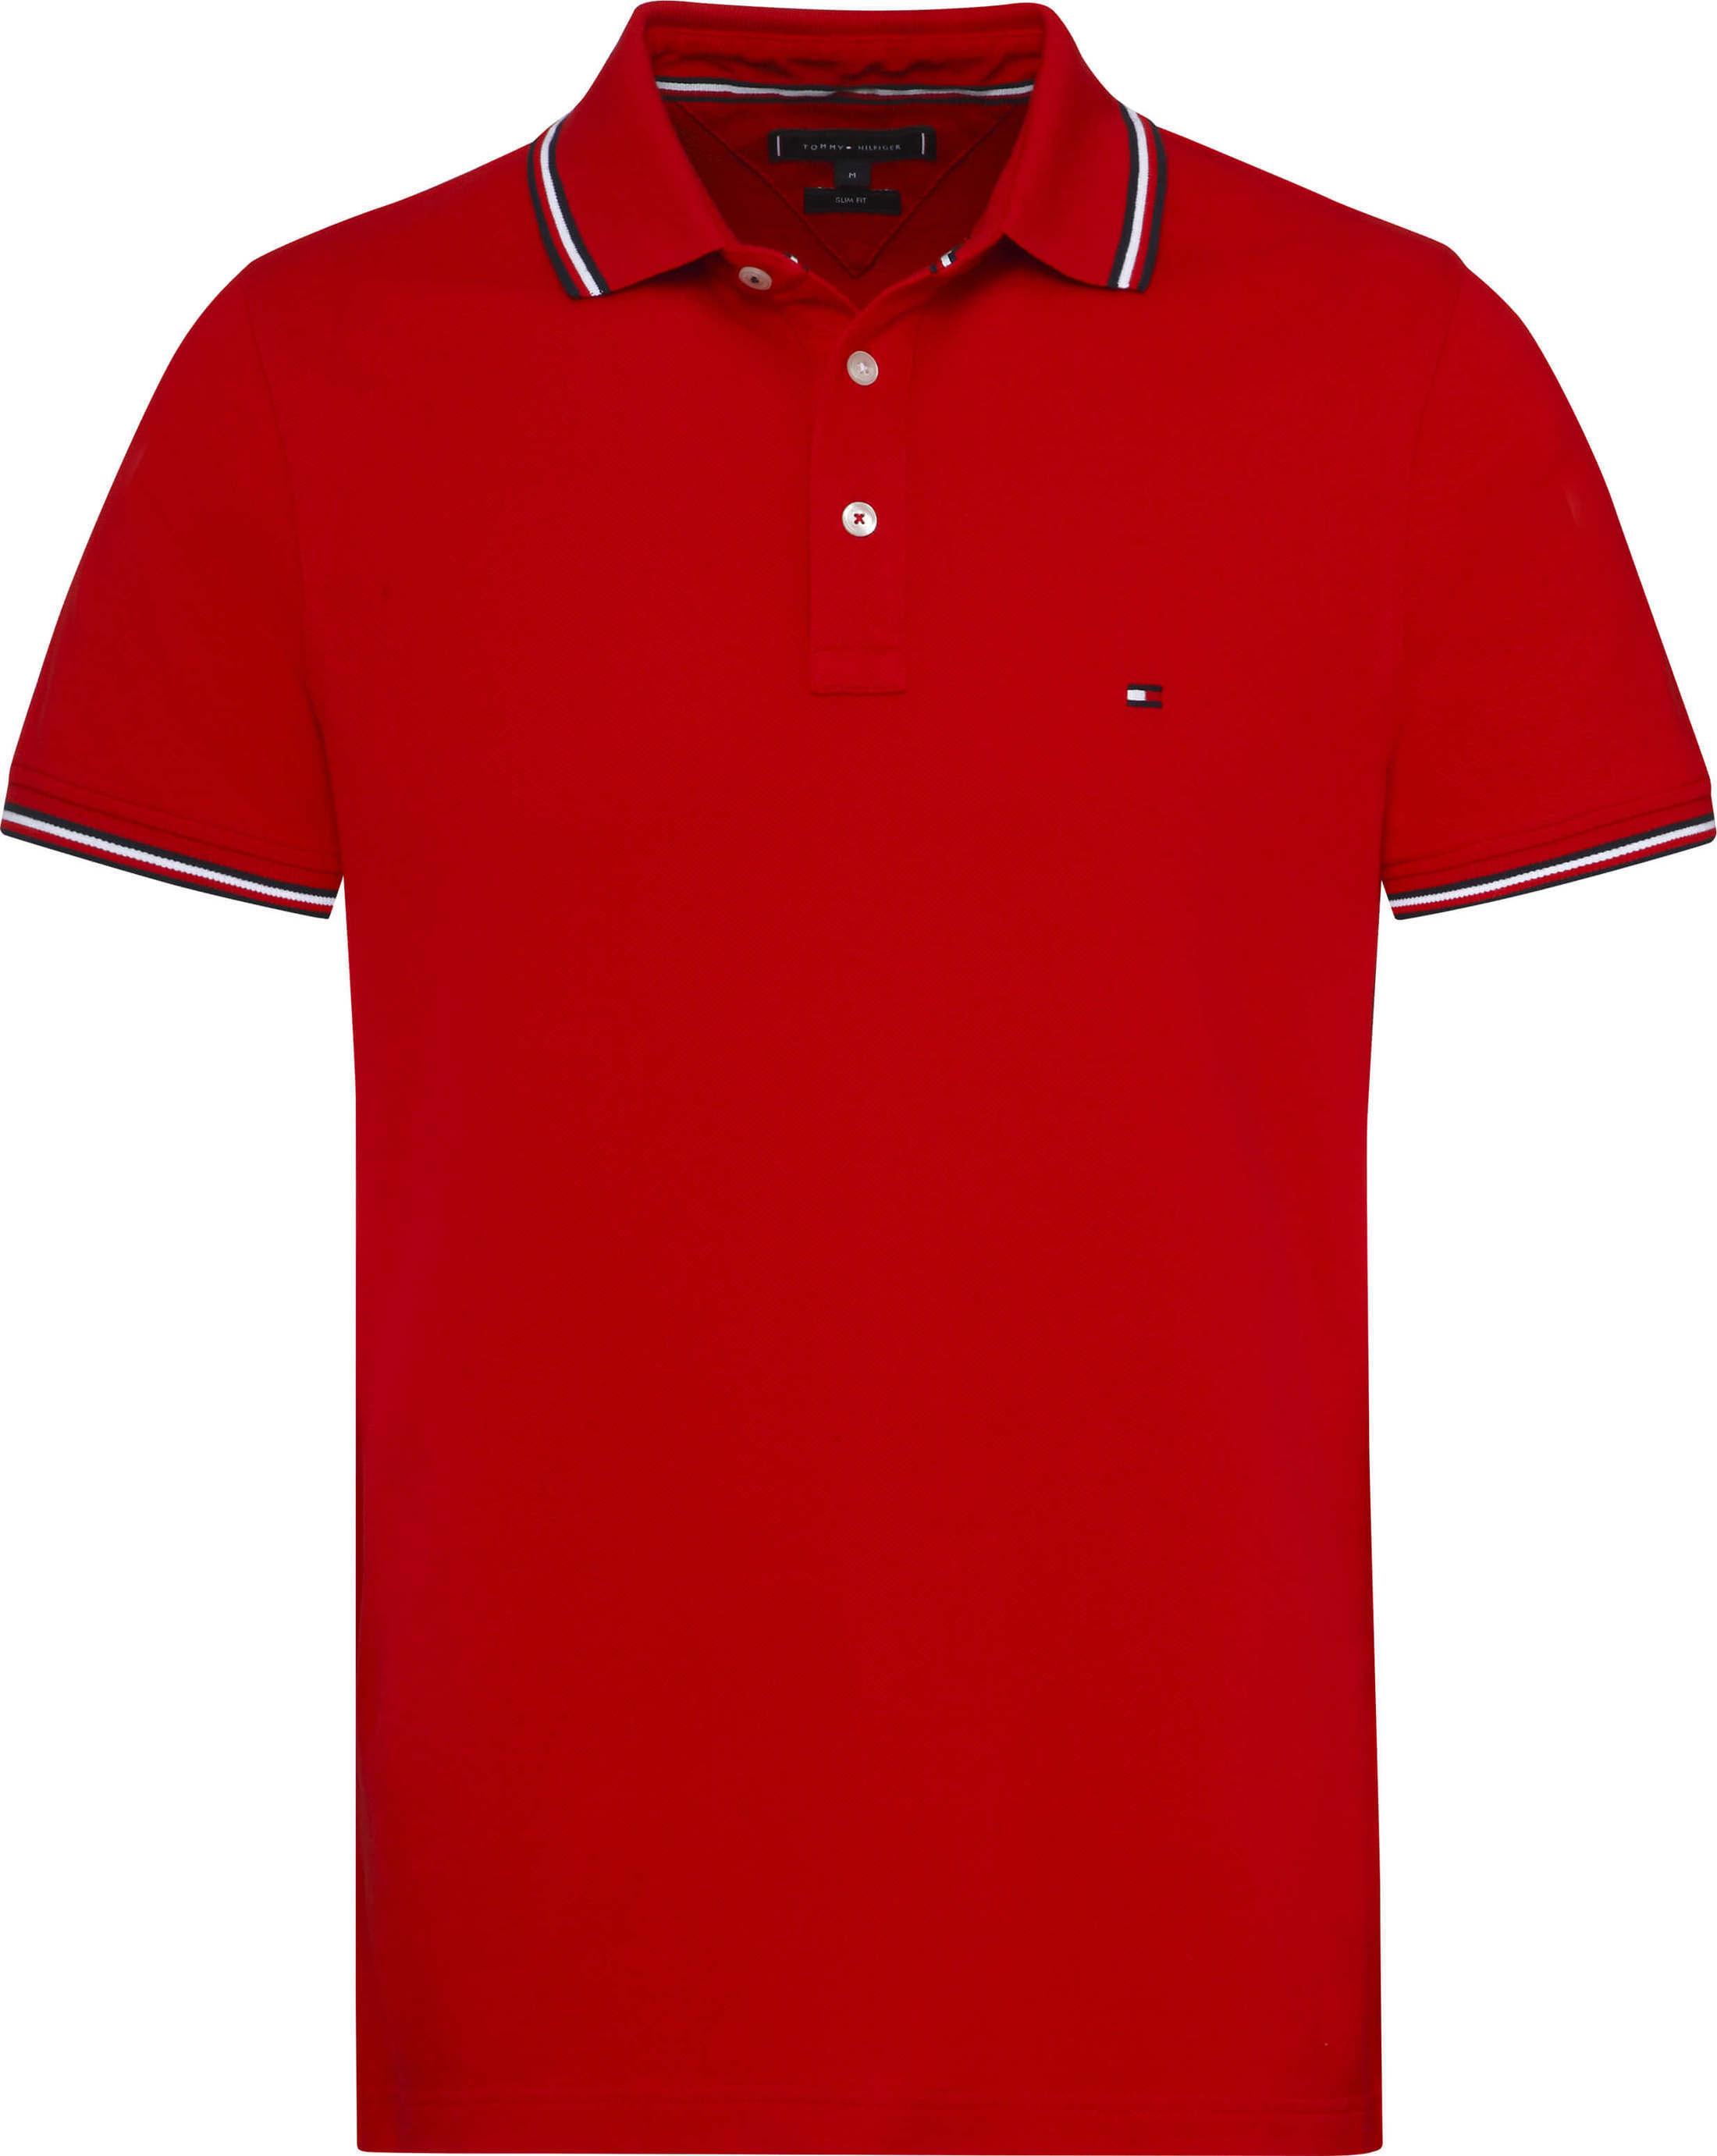 Tommy Hilfiger Stripes Poloshirt Red foto 0